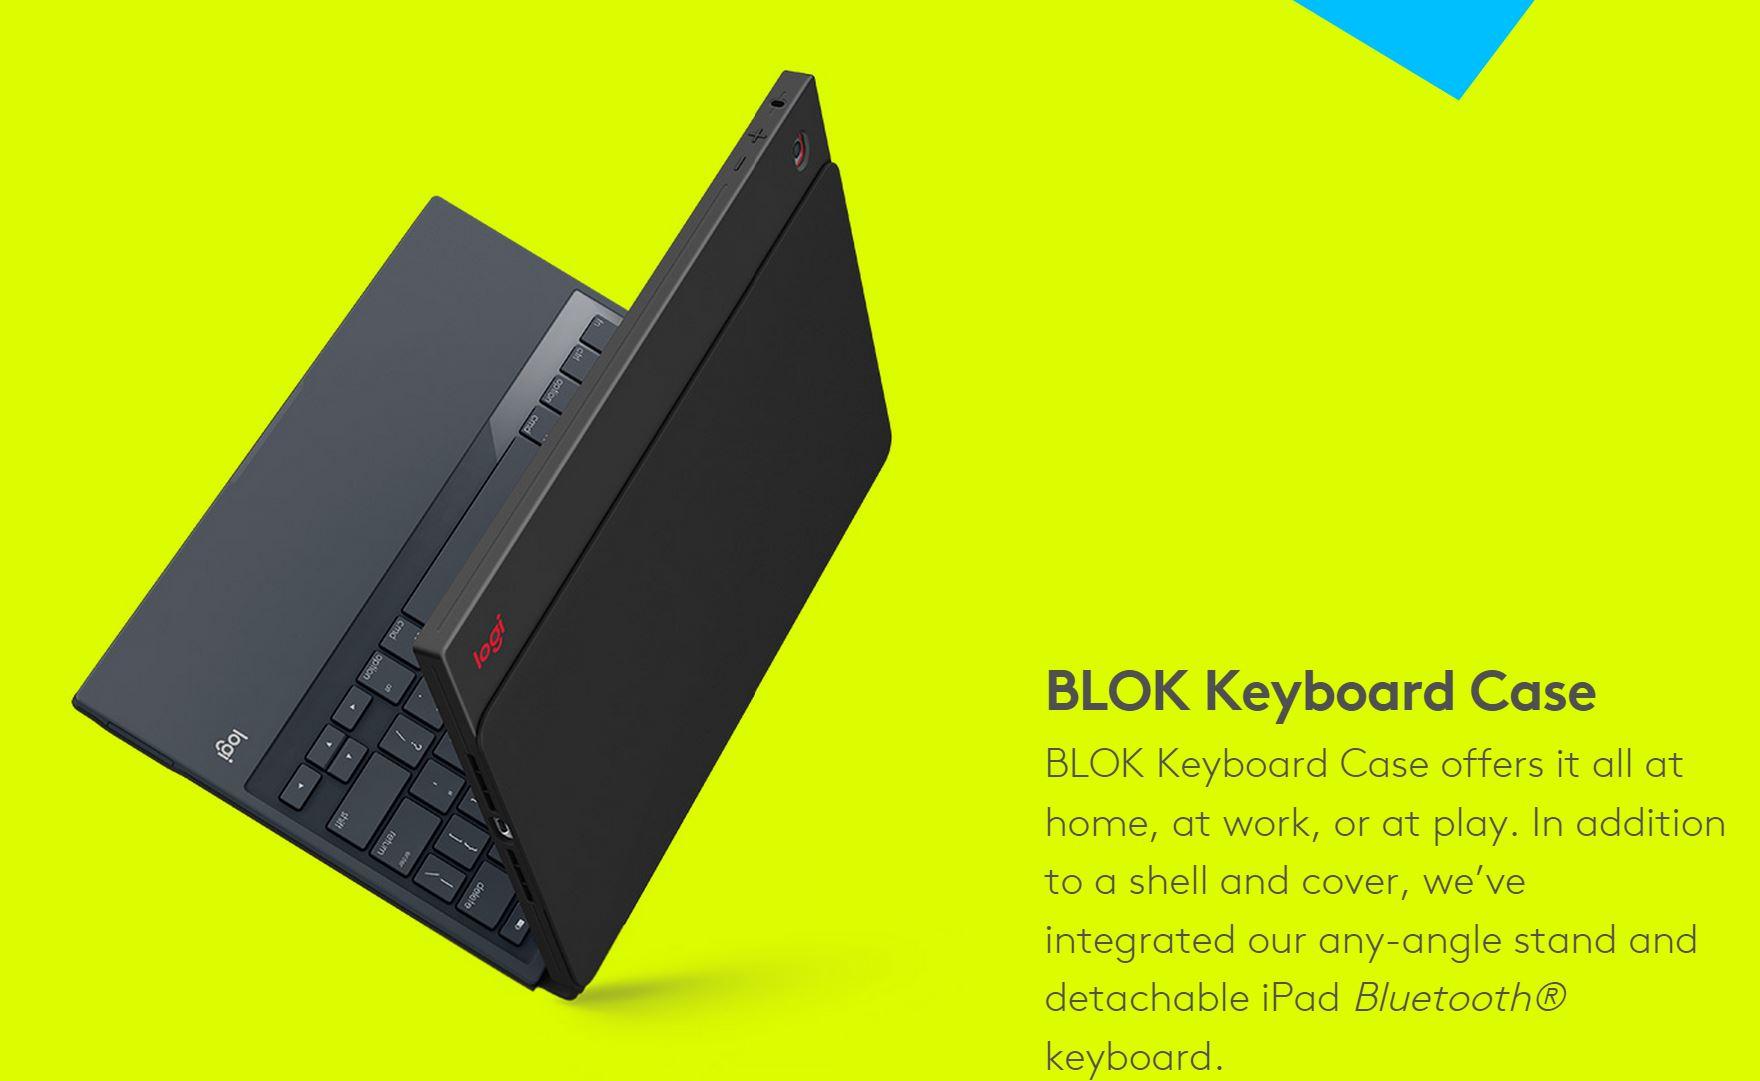 blok-keyboardcase